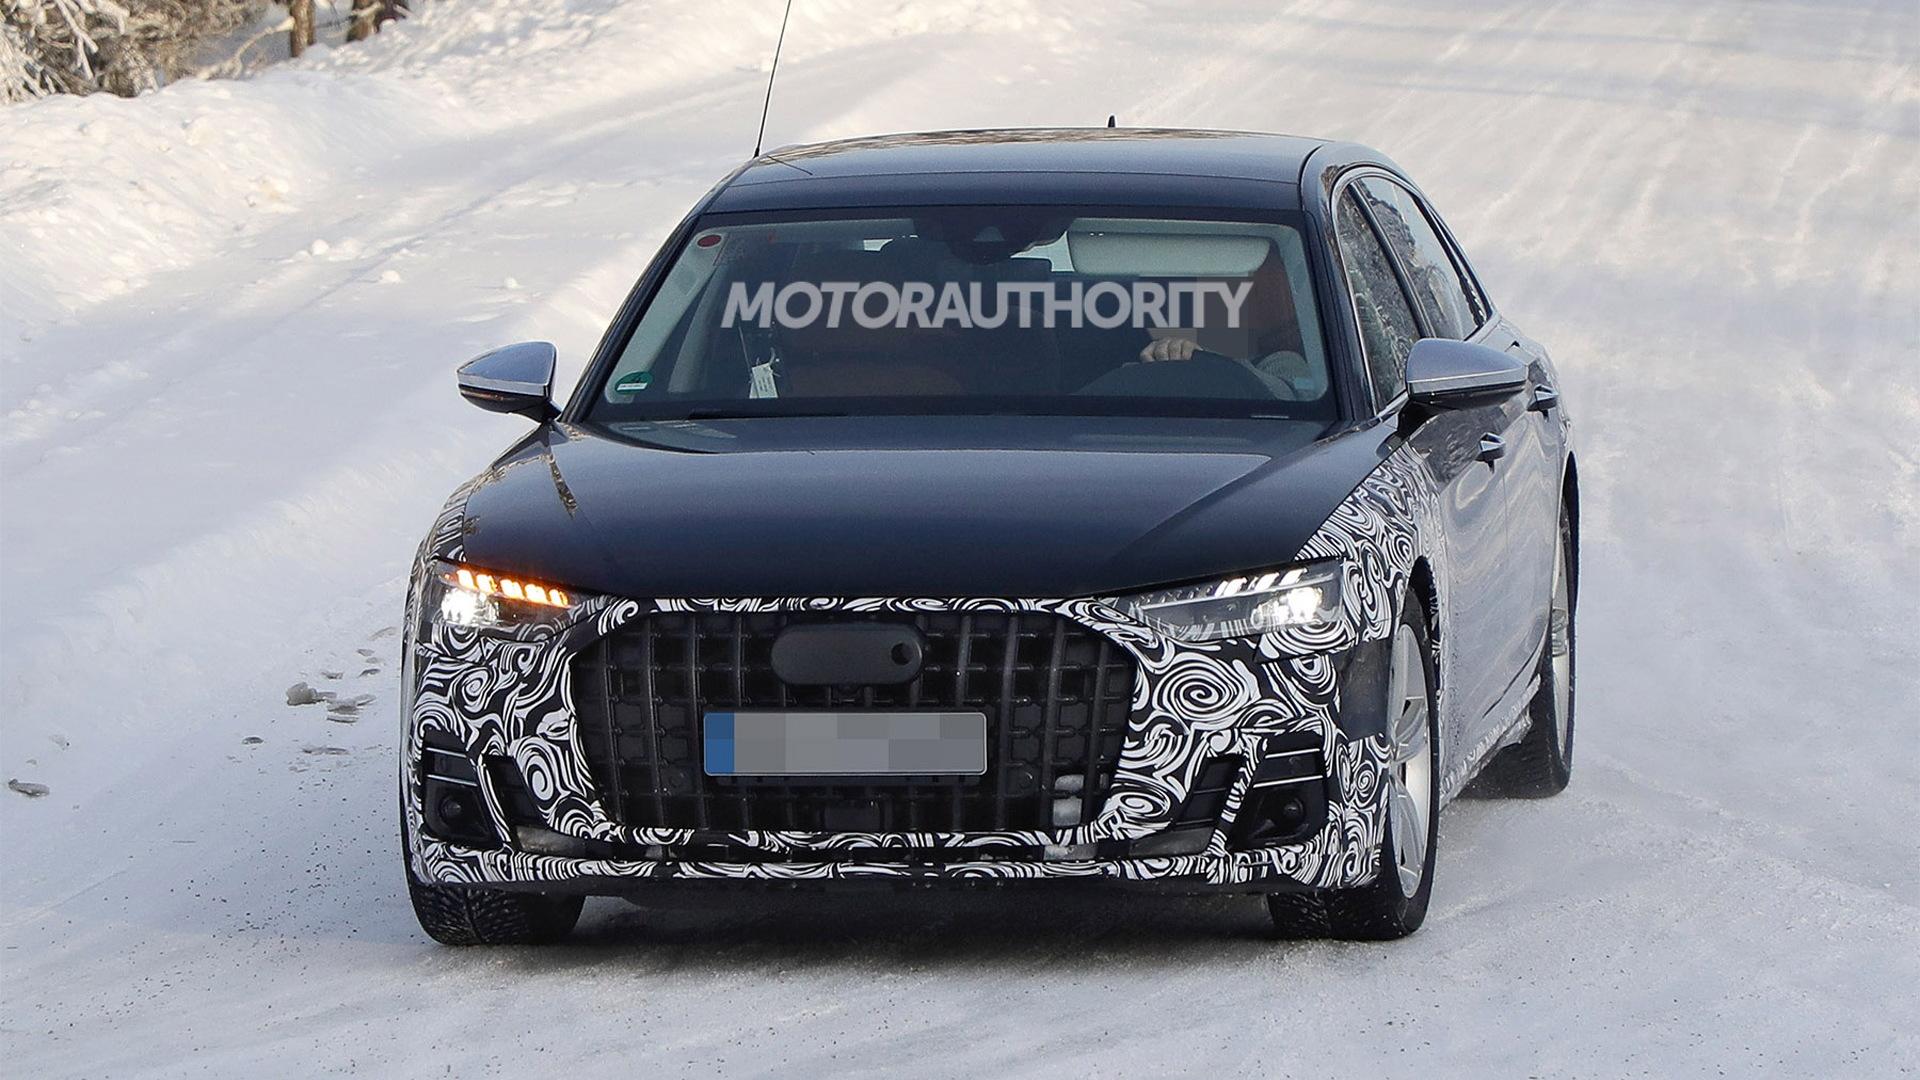 2022 Audi A8 facelift spy shots - Photo credit:S. Baldauf/SB-Medien